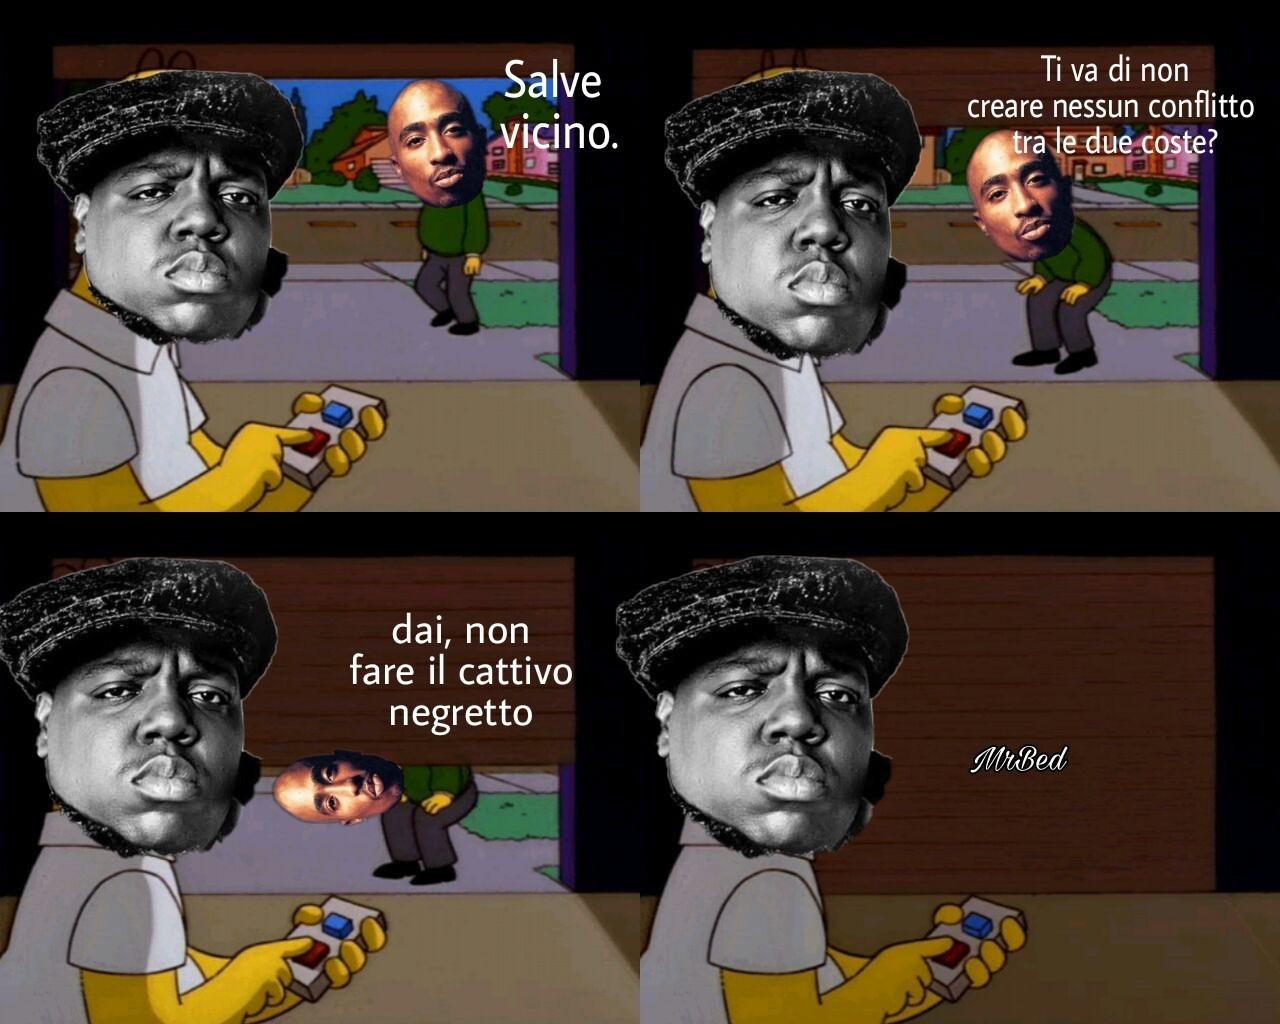 1914-1918 - meme